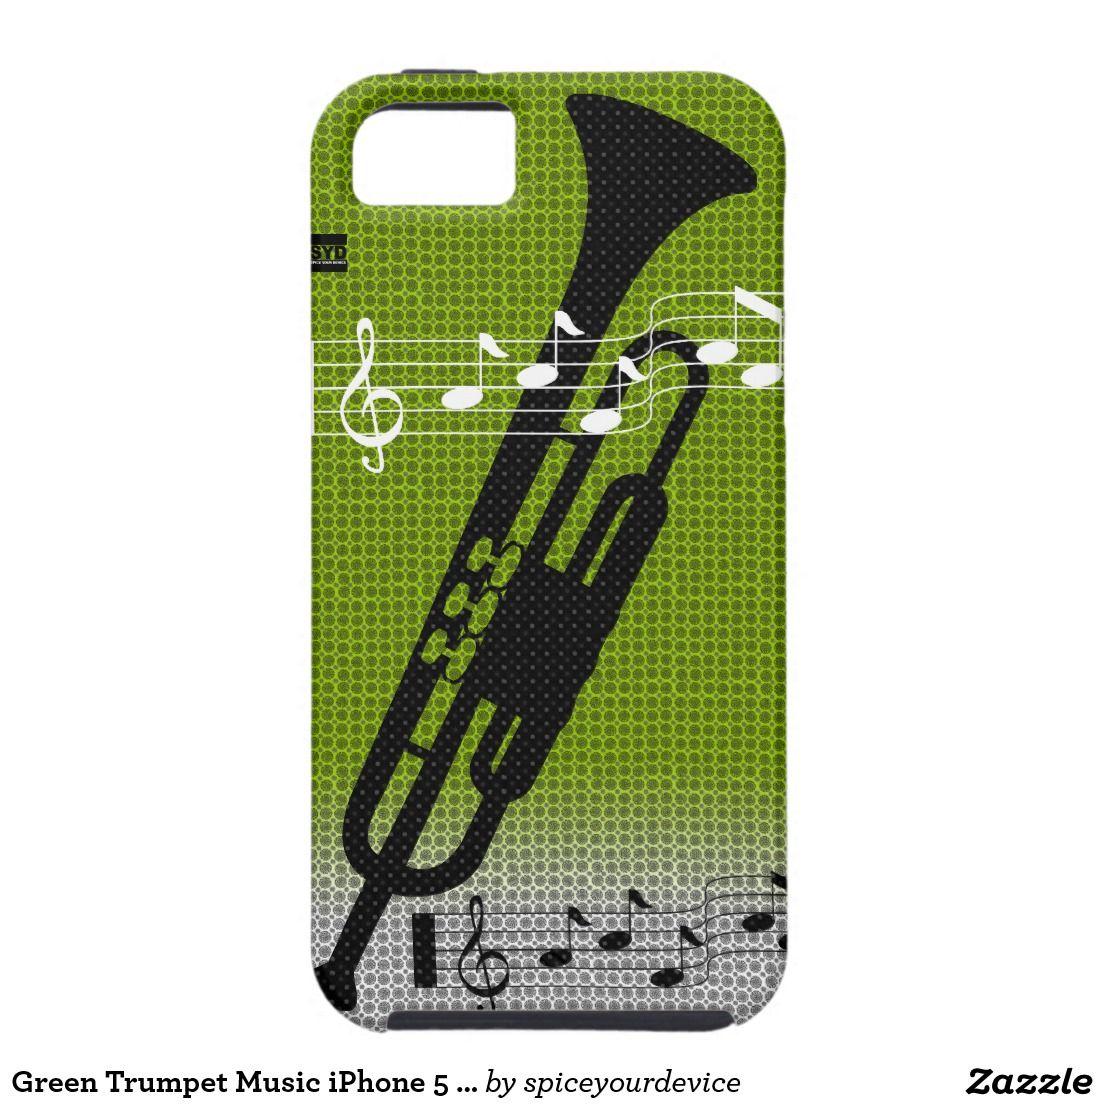 Green Trumpet Music iPhone 5 CaseMate Case